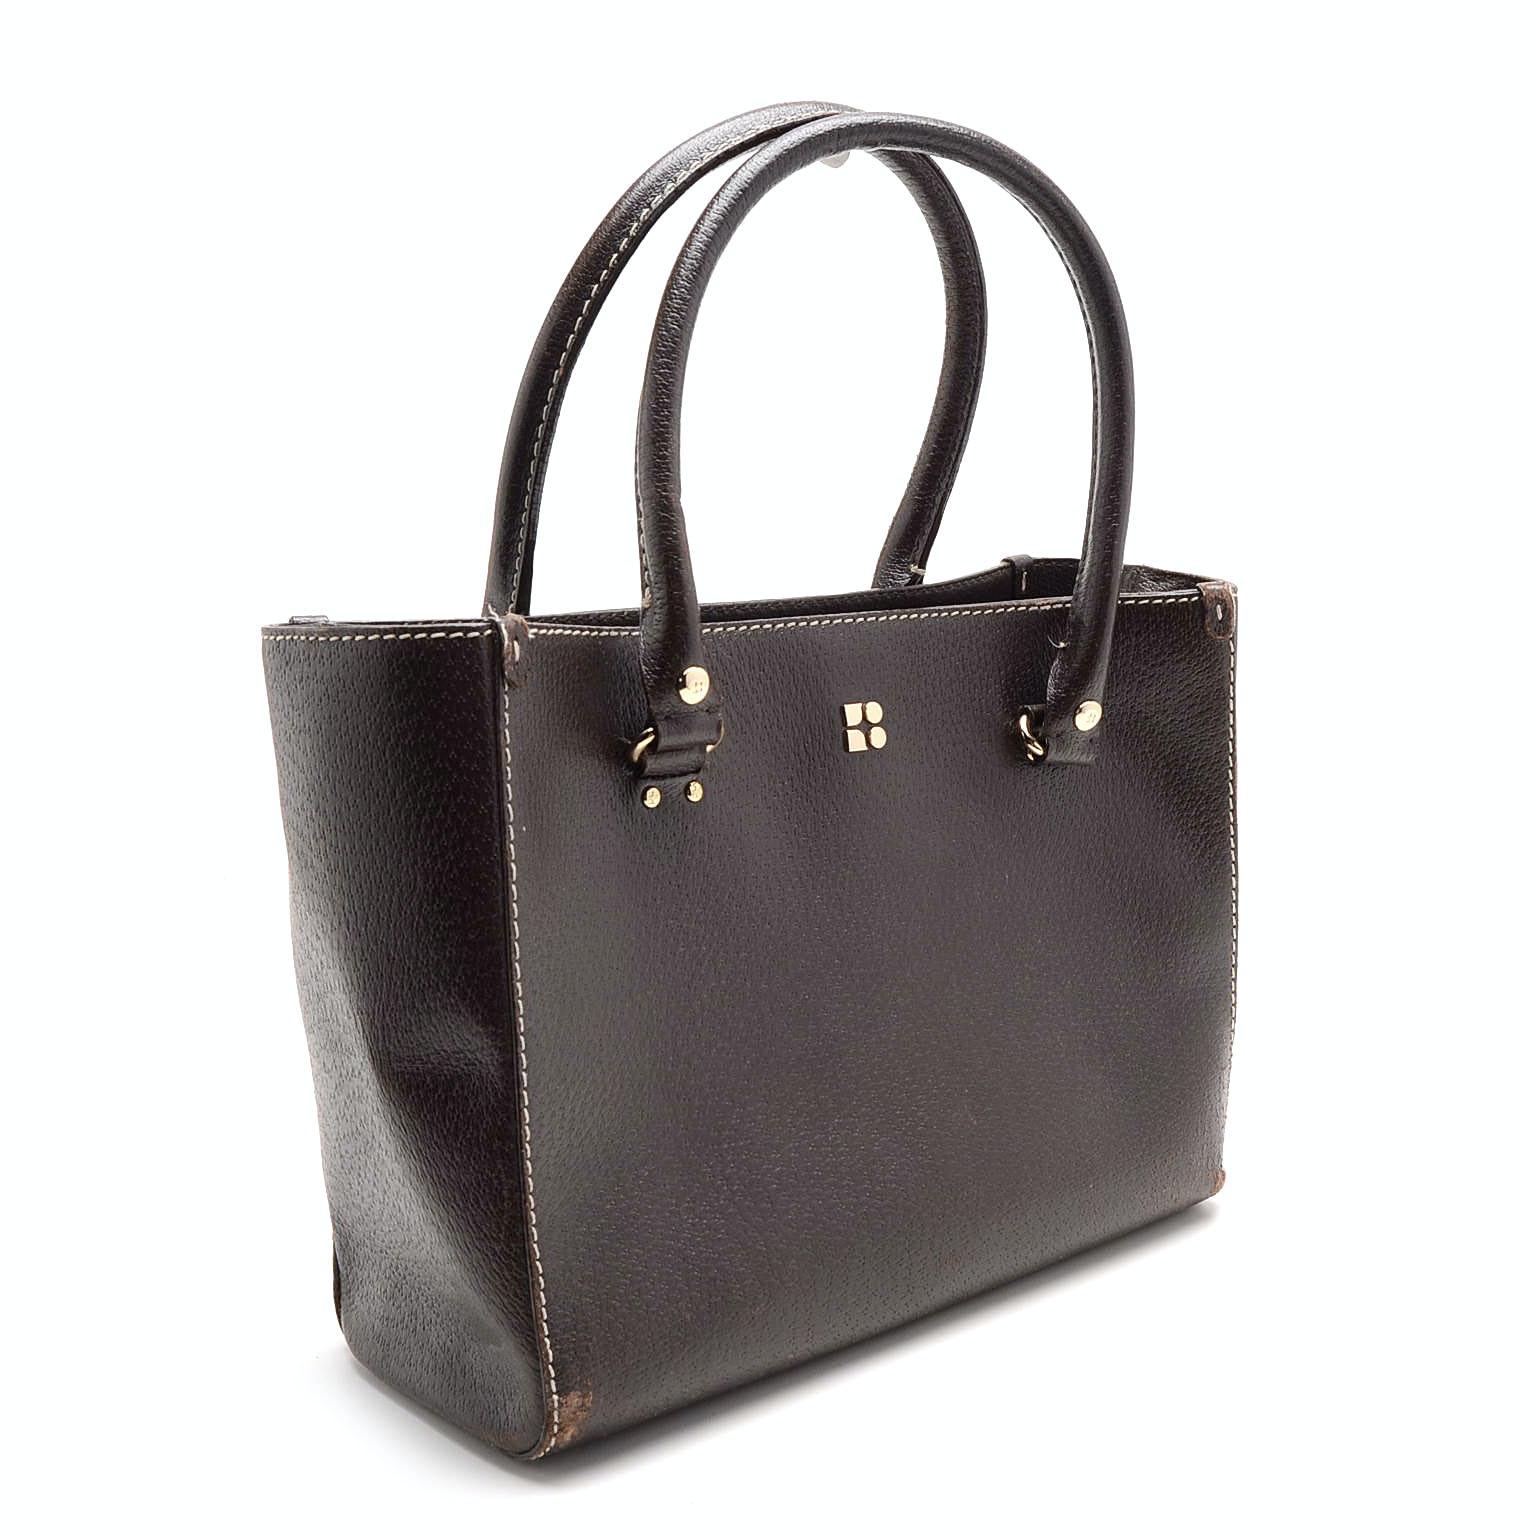 Kate Spade Brown Leather Satchel